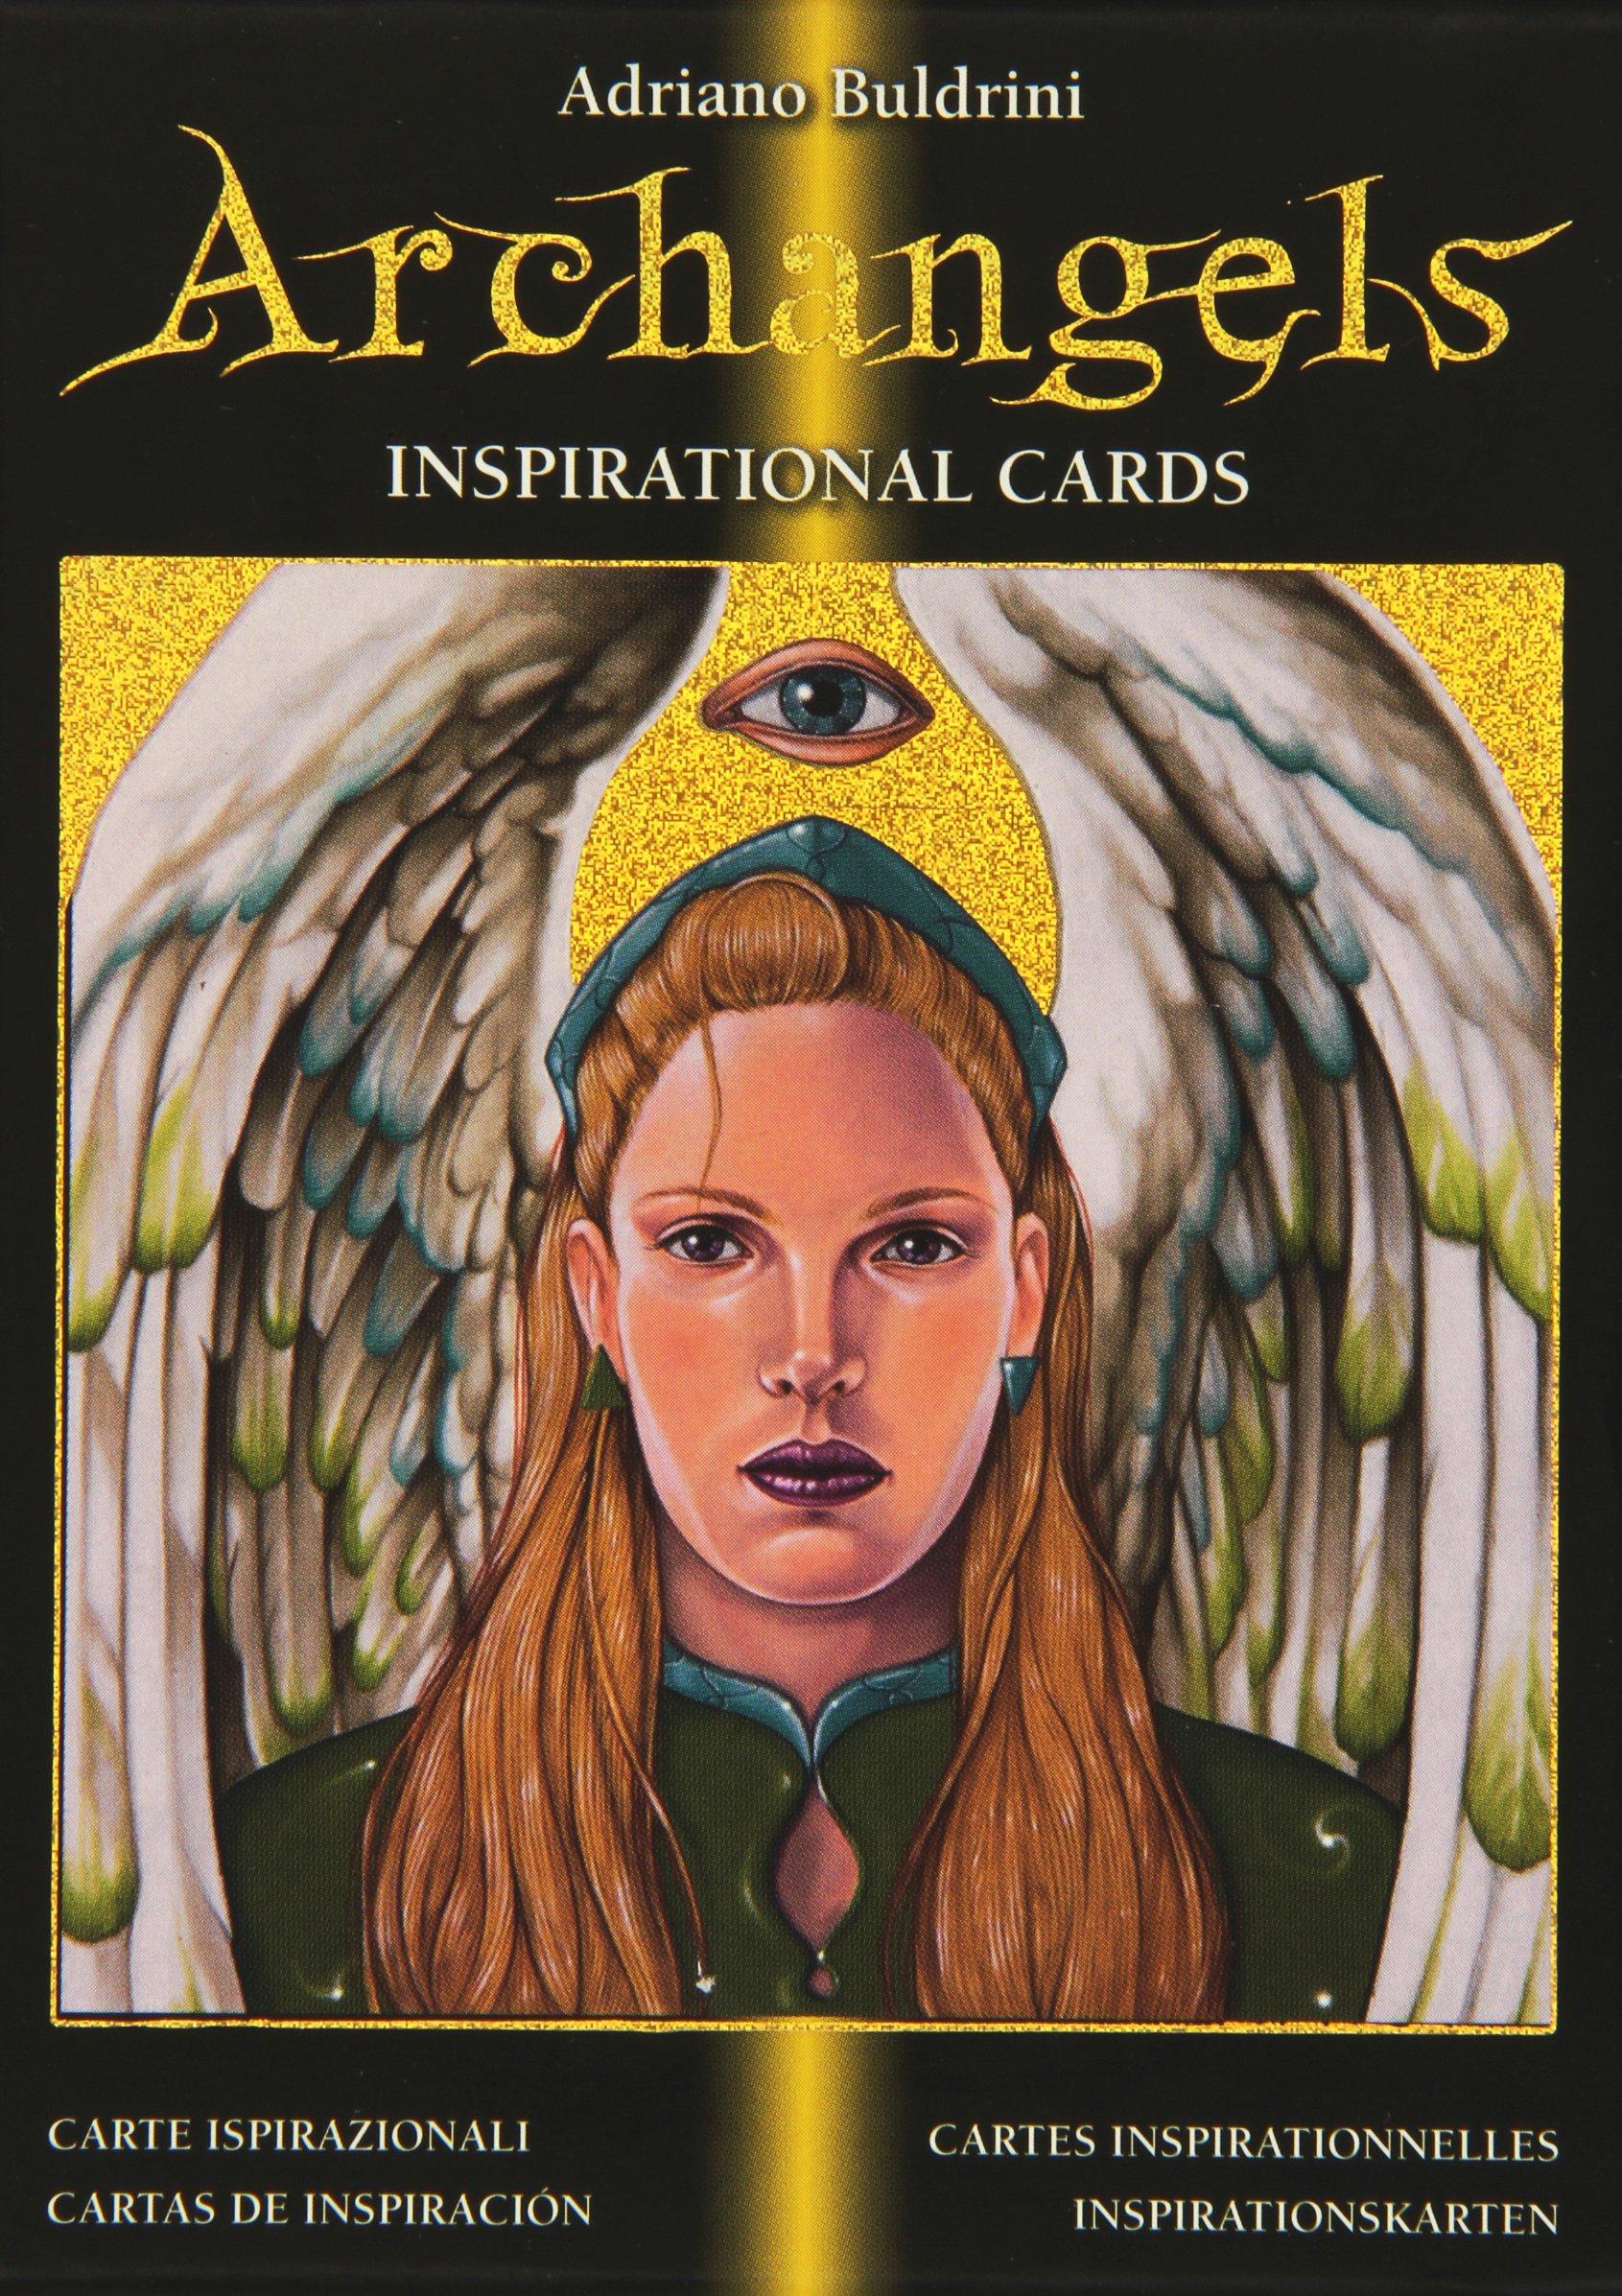 Archangels Oracle Cards Broché – 15 février 2013 Adriano Buldrini Lo Scarabeo 8865271442 9788865271445shpgf